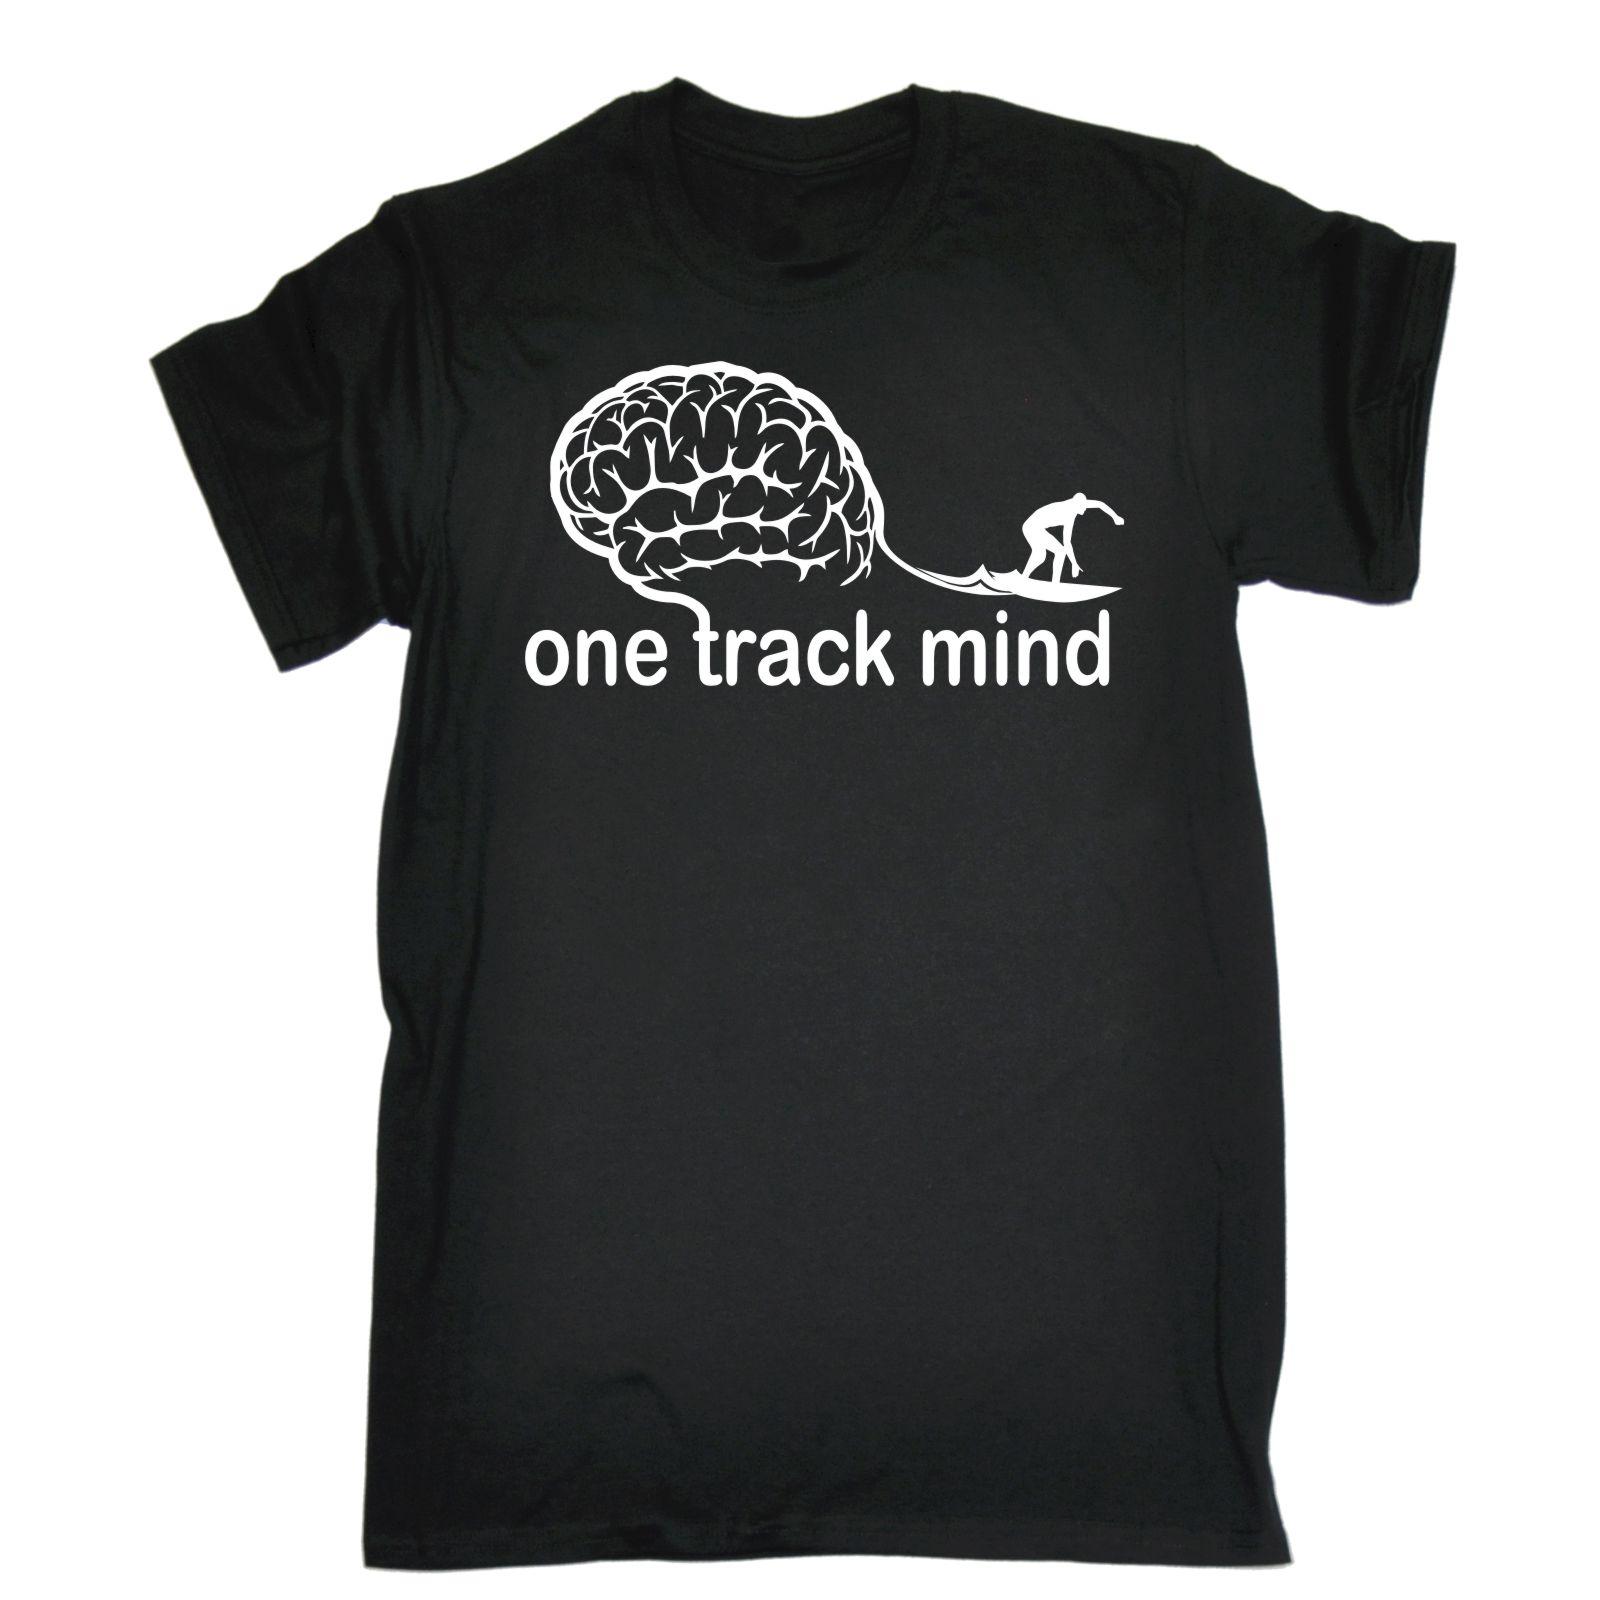 Camiseta One Track Mind Surfer para hombre, camiseta divertida para regalo de cumpleaños, ropa para Surfinger, camiseta de moda para hombre/niño, camisetas geniales de manga corta